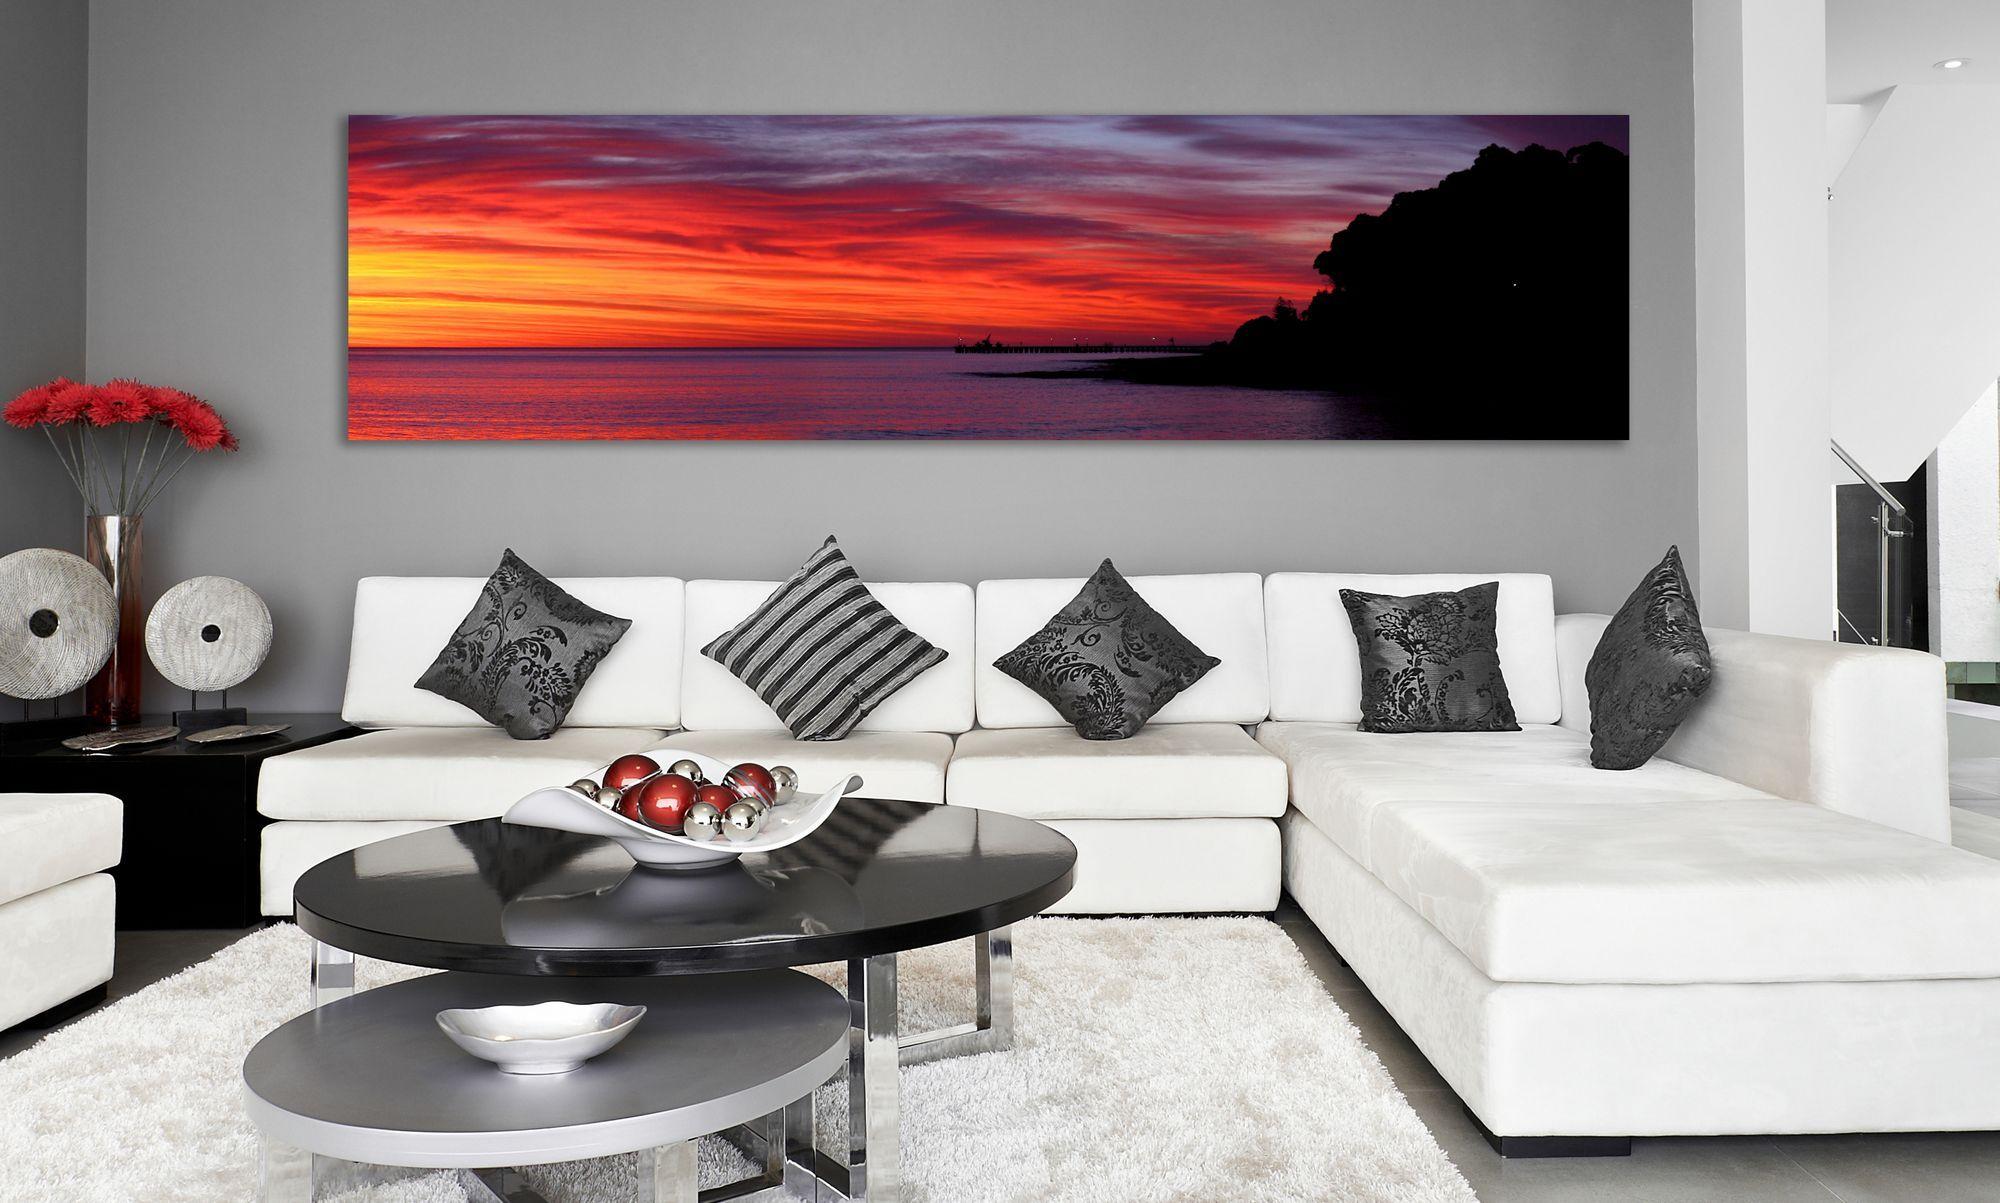 WMPG0162-termeszet-tengerparti-naplemente-szoba